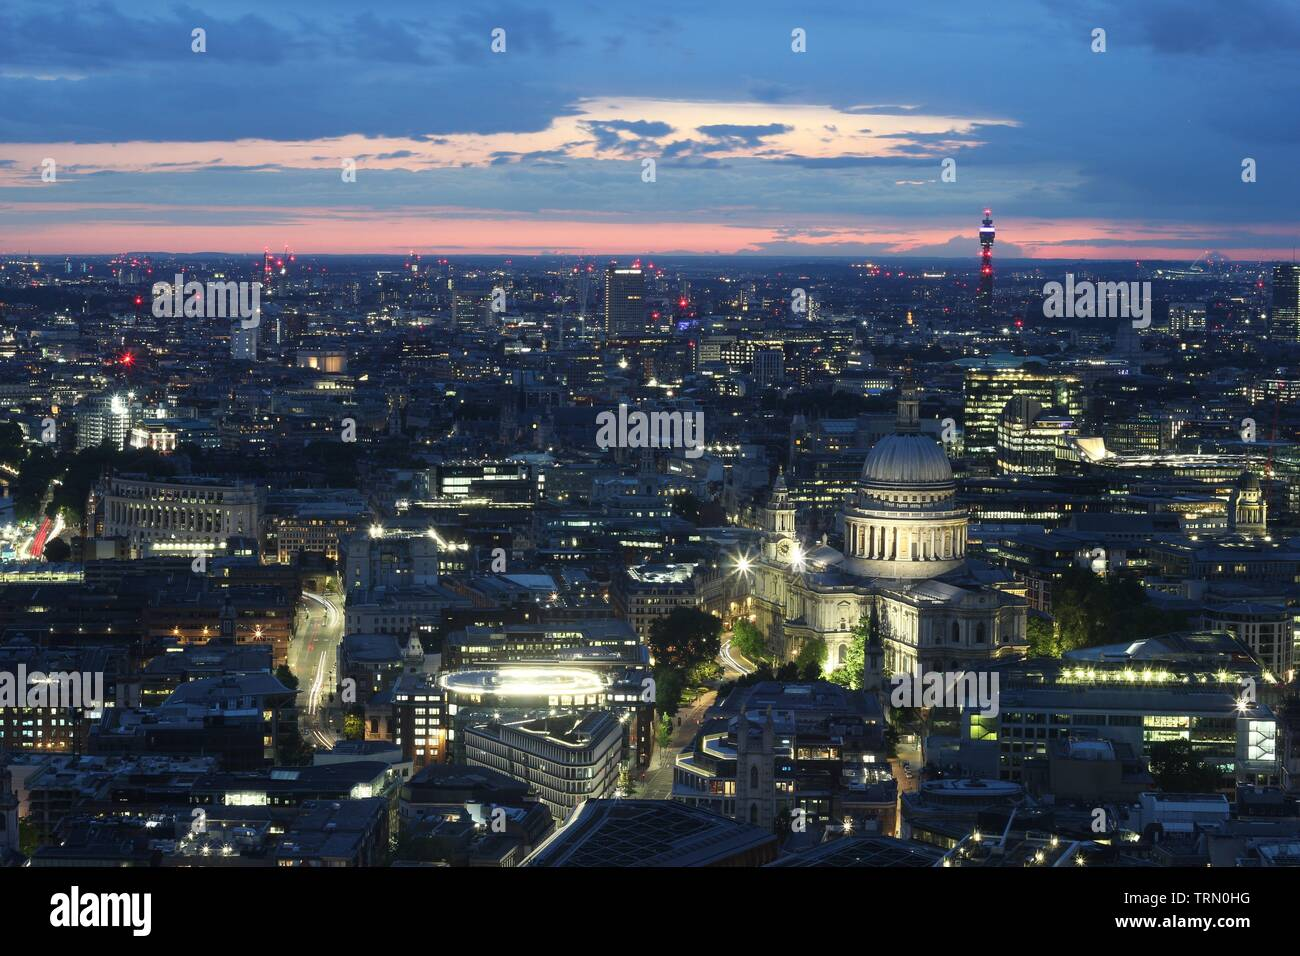 London skyline at summer sunset, England - Stock Image